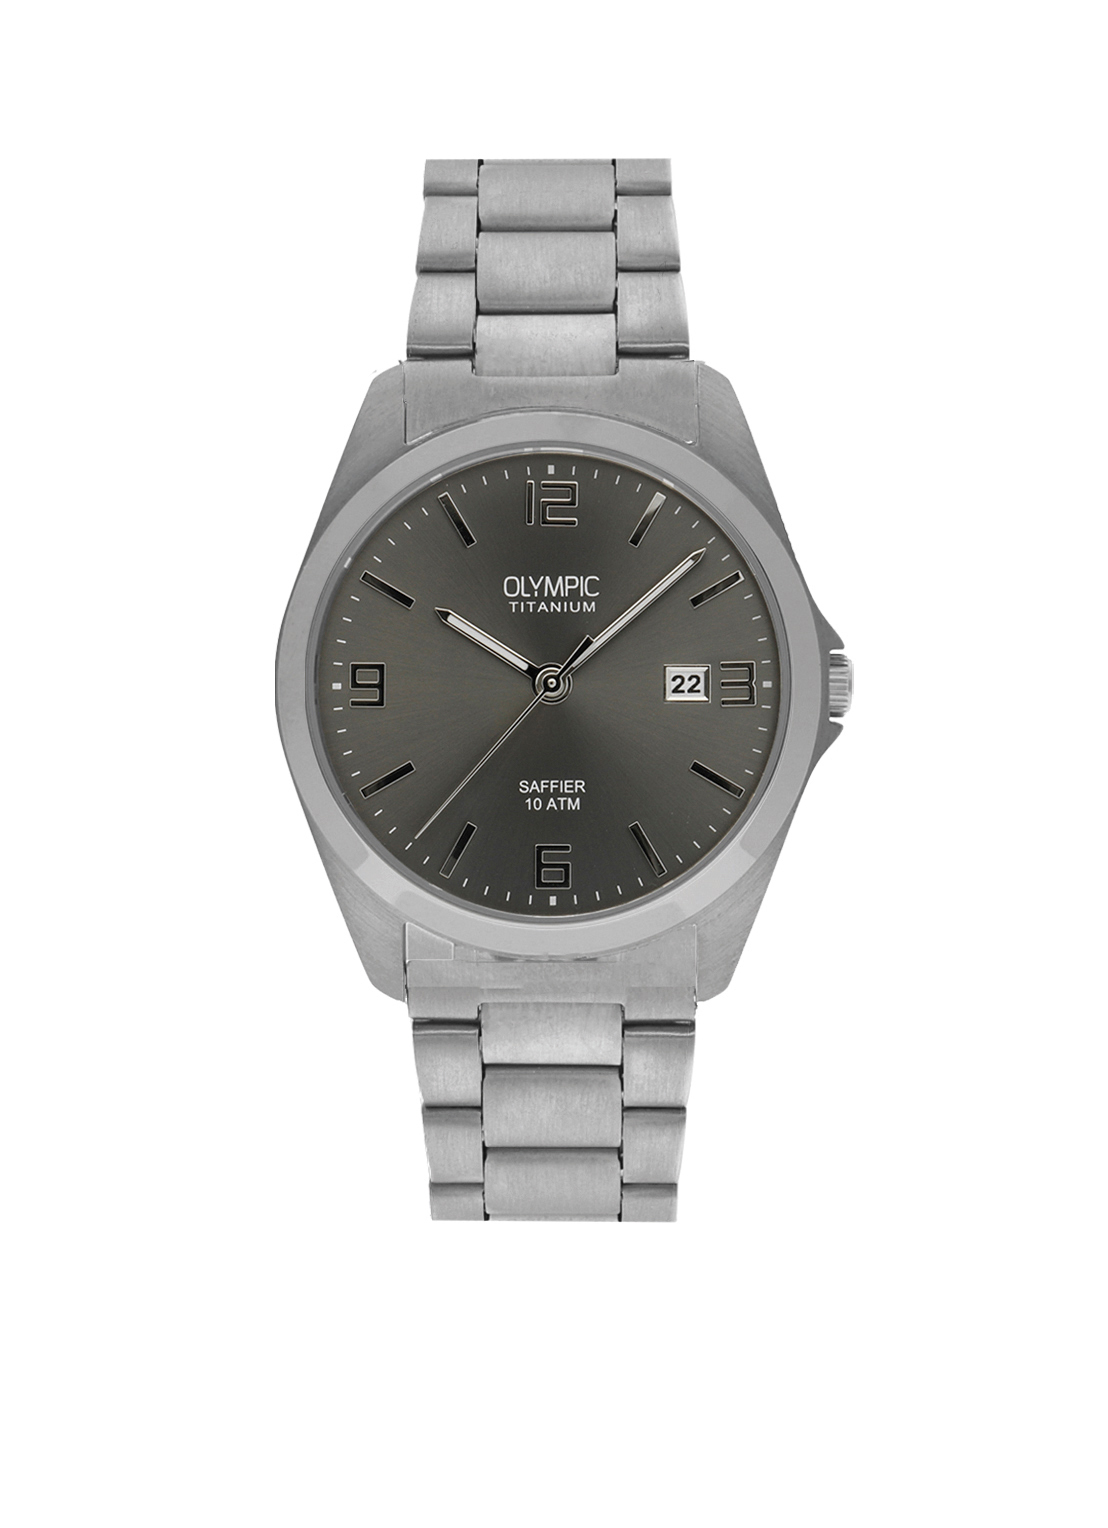 Olympic OL26HTT201 Bergamo Horloge Titanium Zilverkleurig 38mm Heren